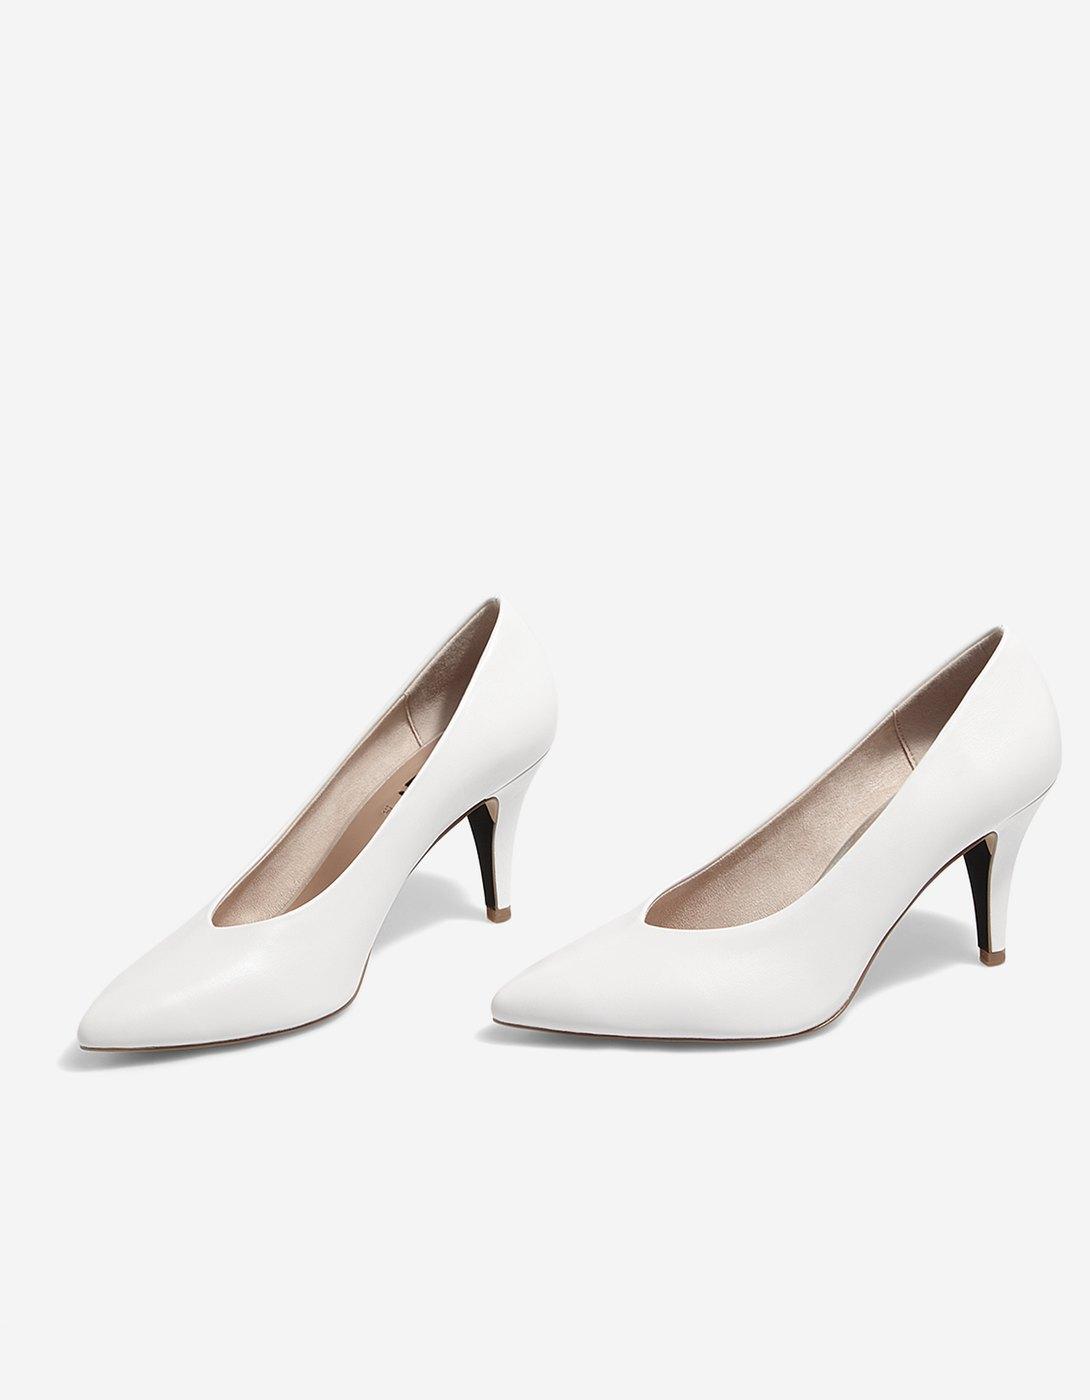 stradivarius-pointed-heel